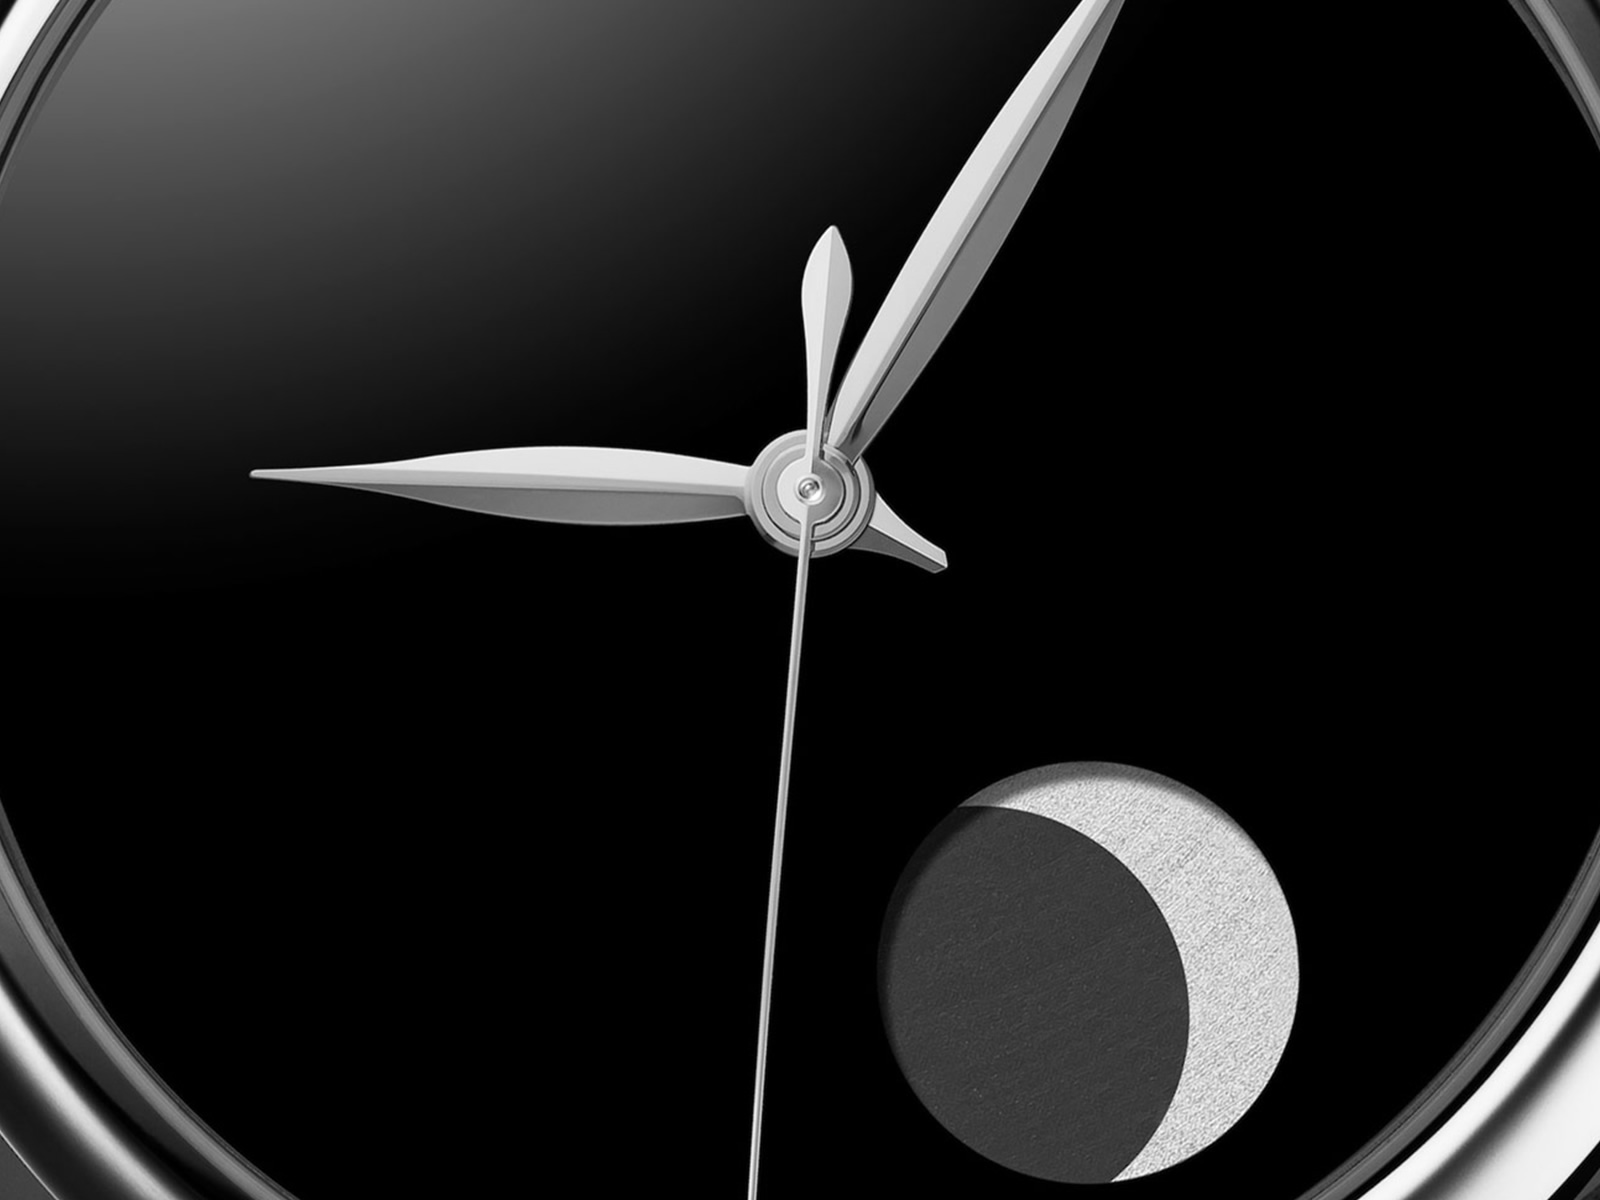 1801-1200-h-moser-cie-endeavour-perpetual-moon-concept-3-.jpg